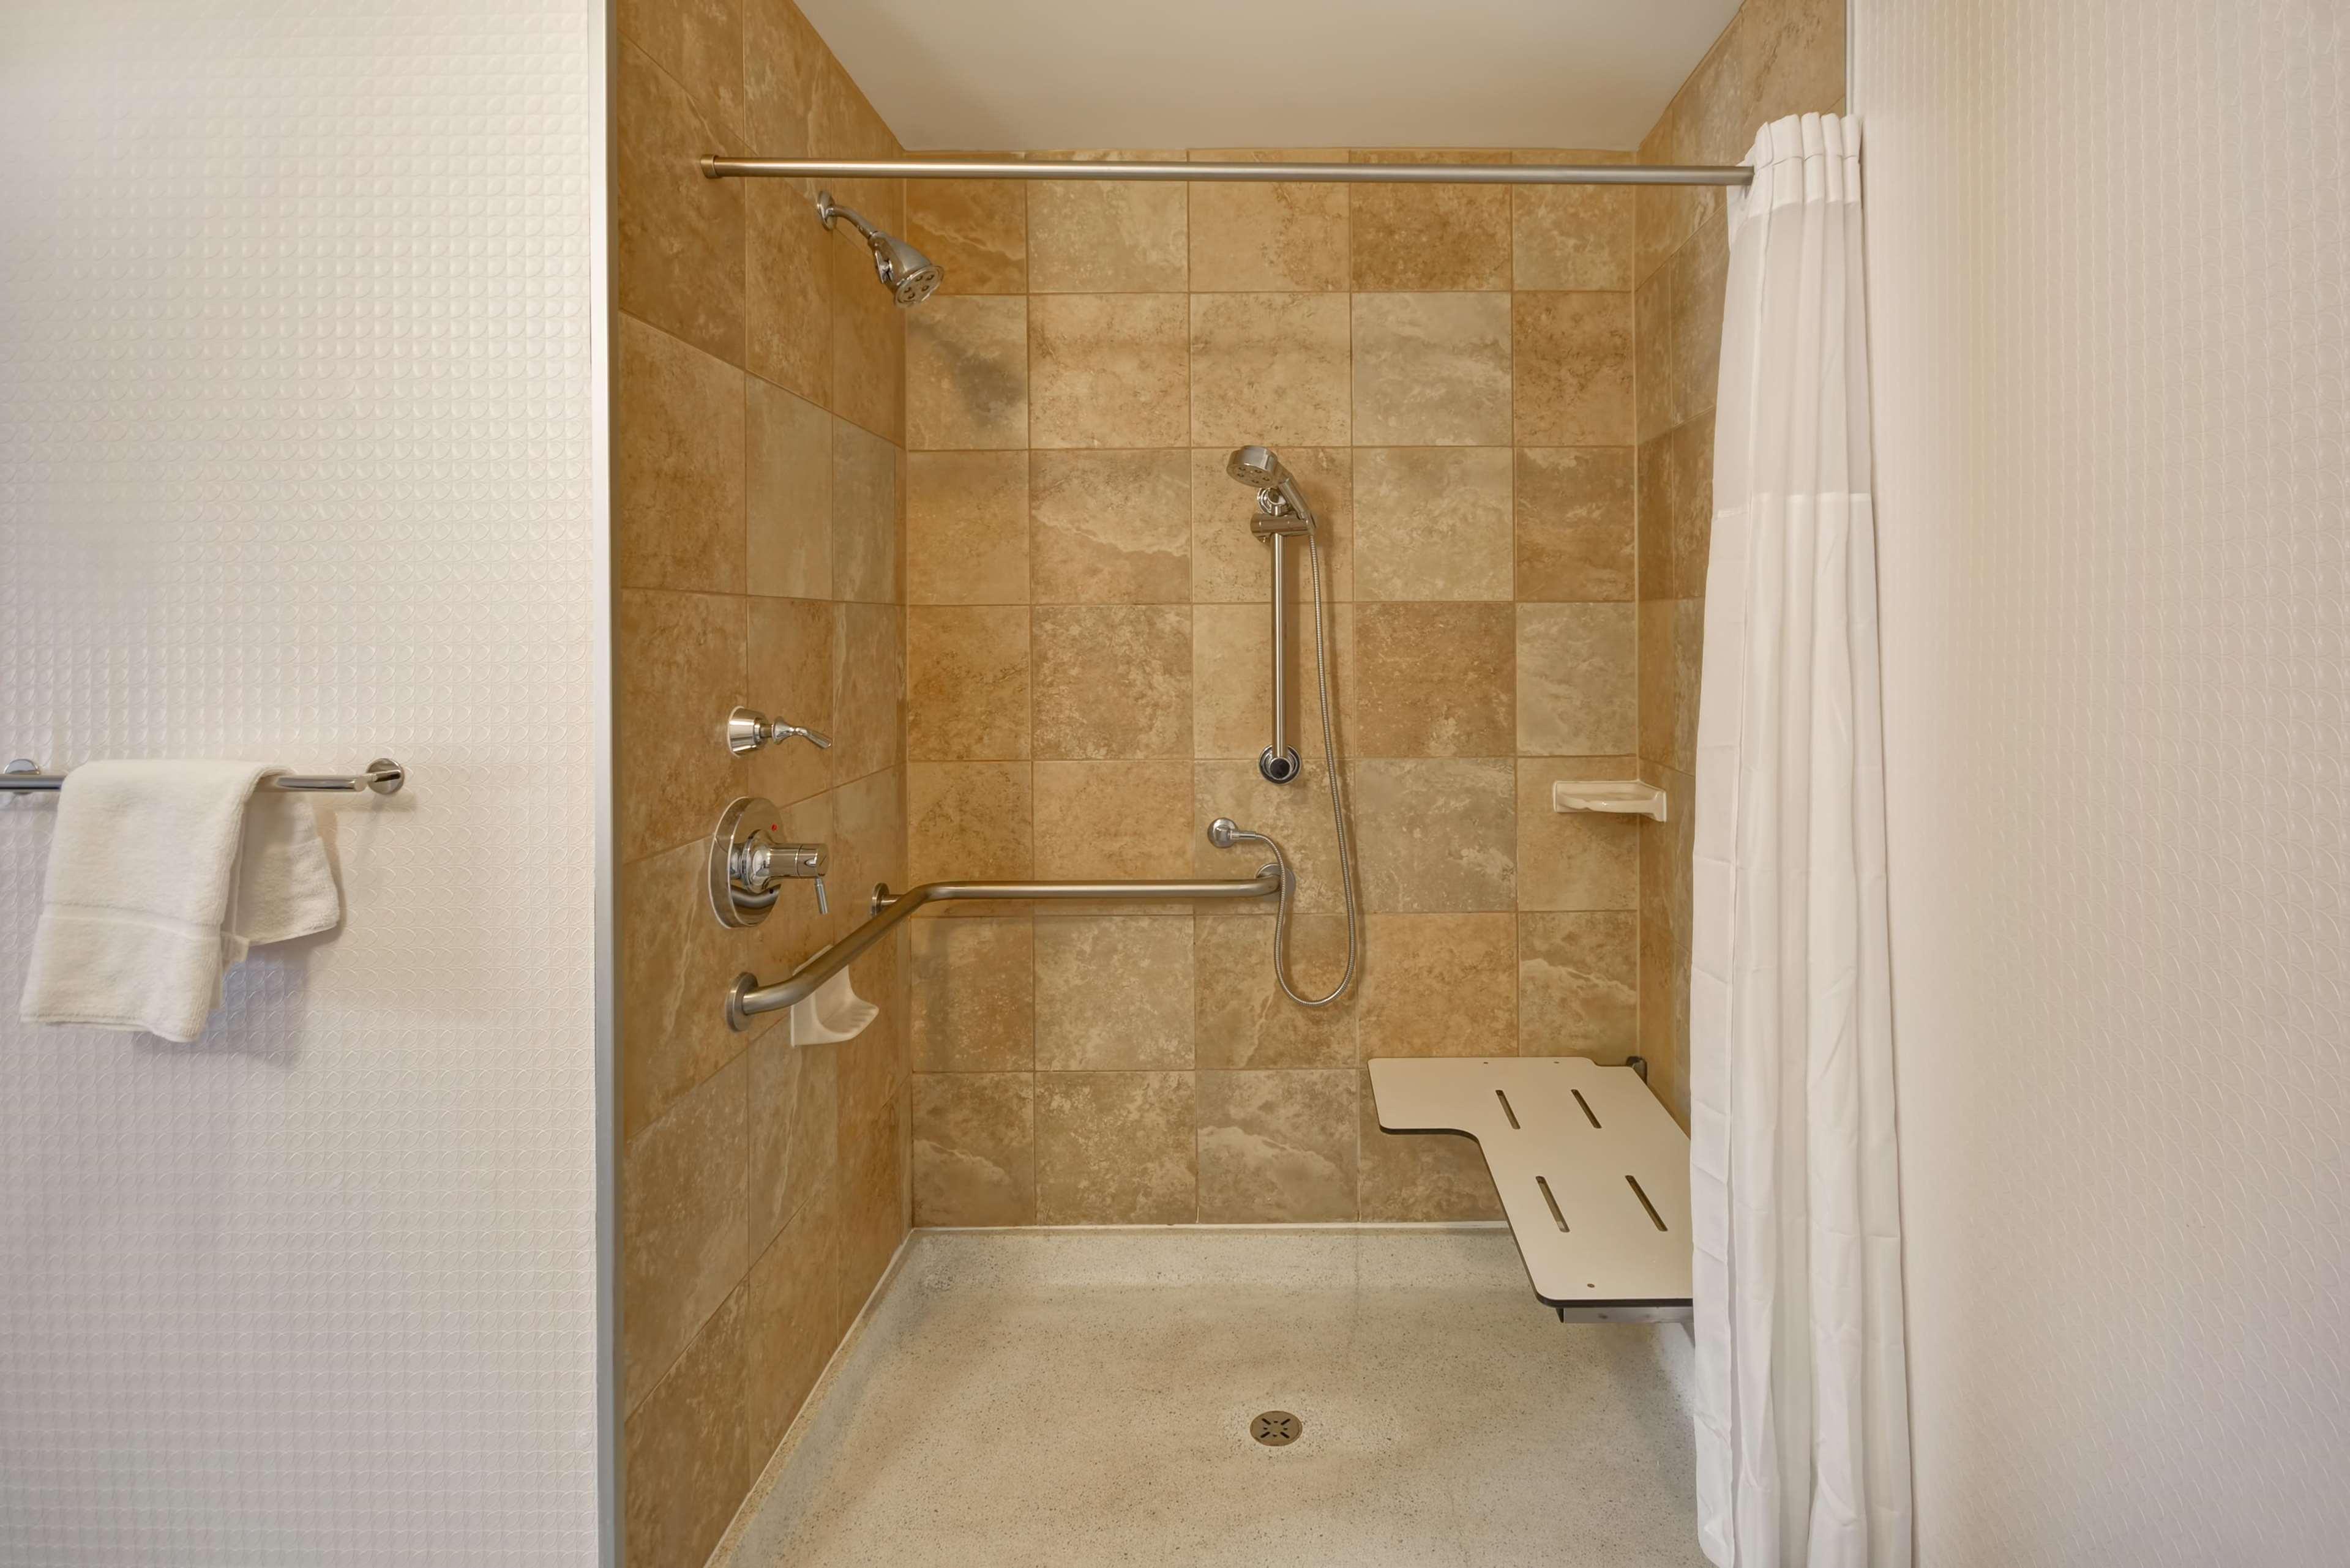 Hampton Inn & Suites Columbus-Easton Area image 43